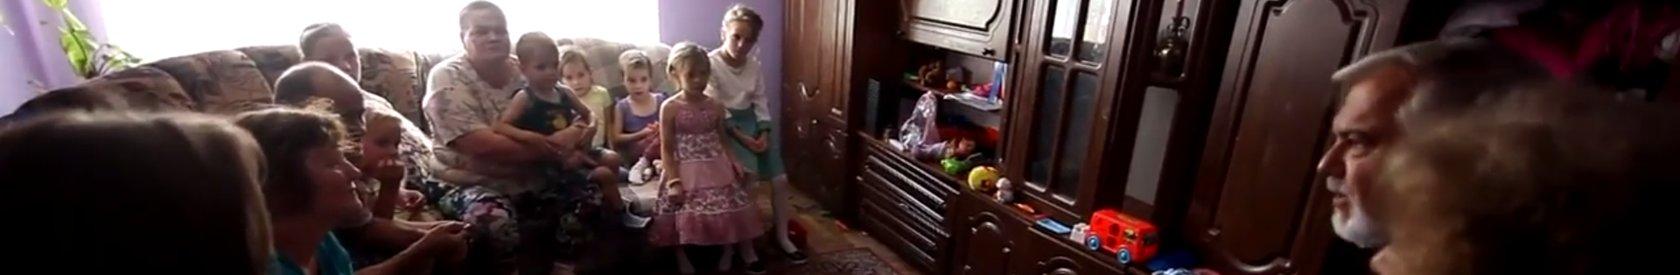 Wilf and Irene Visit their Sponsored Children